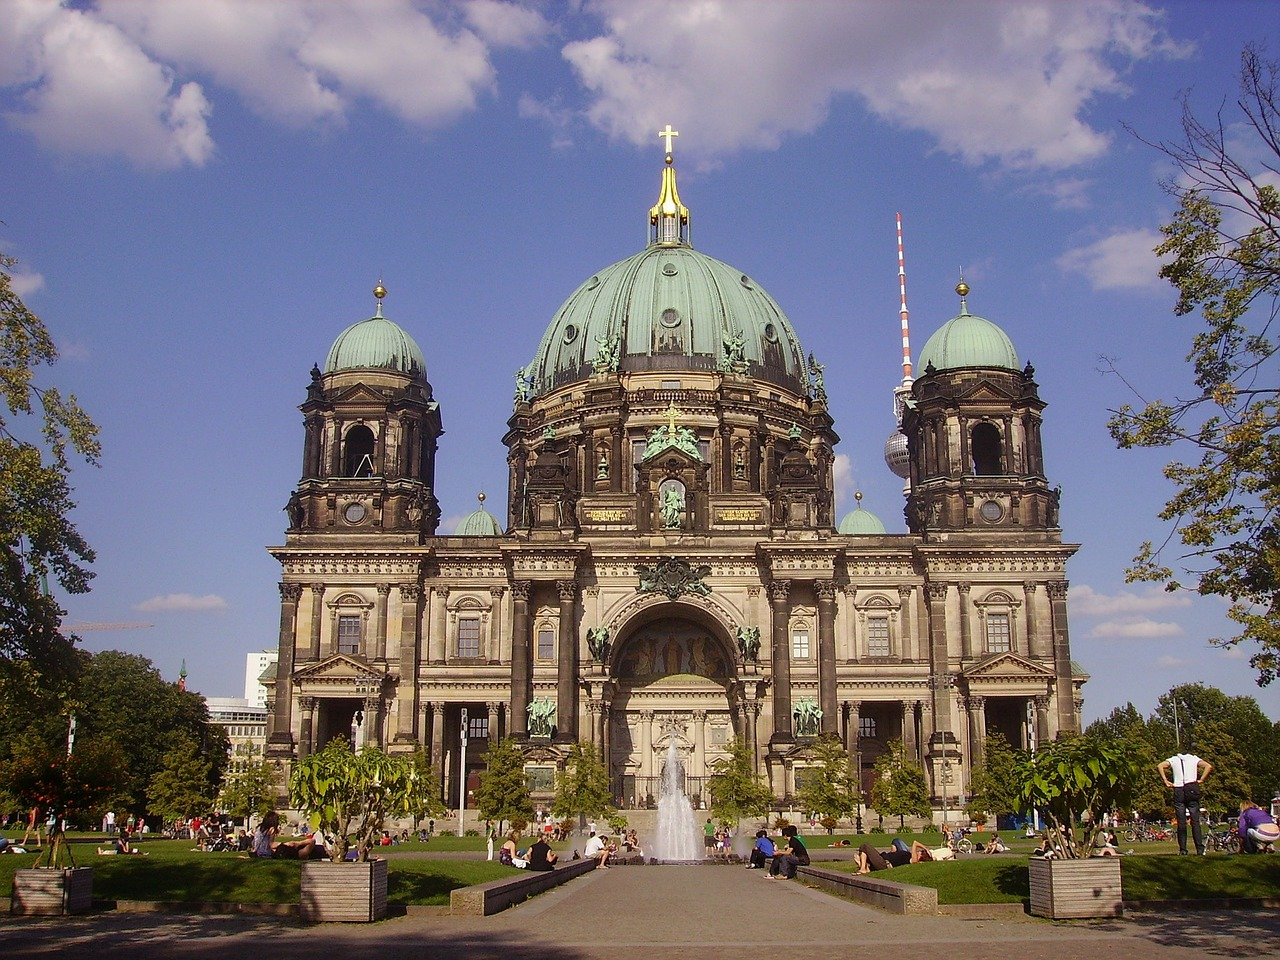 berlin-91850_1280